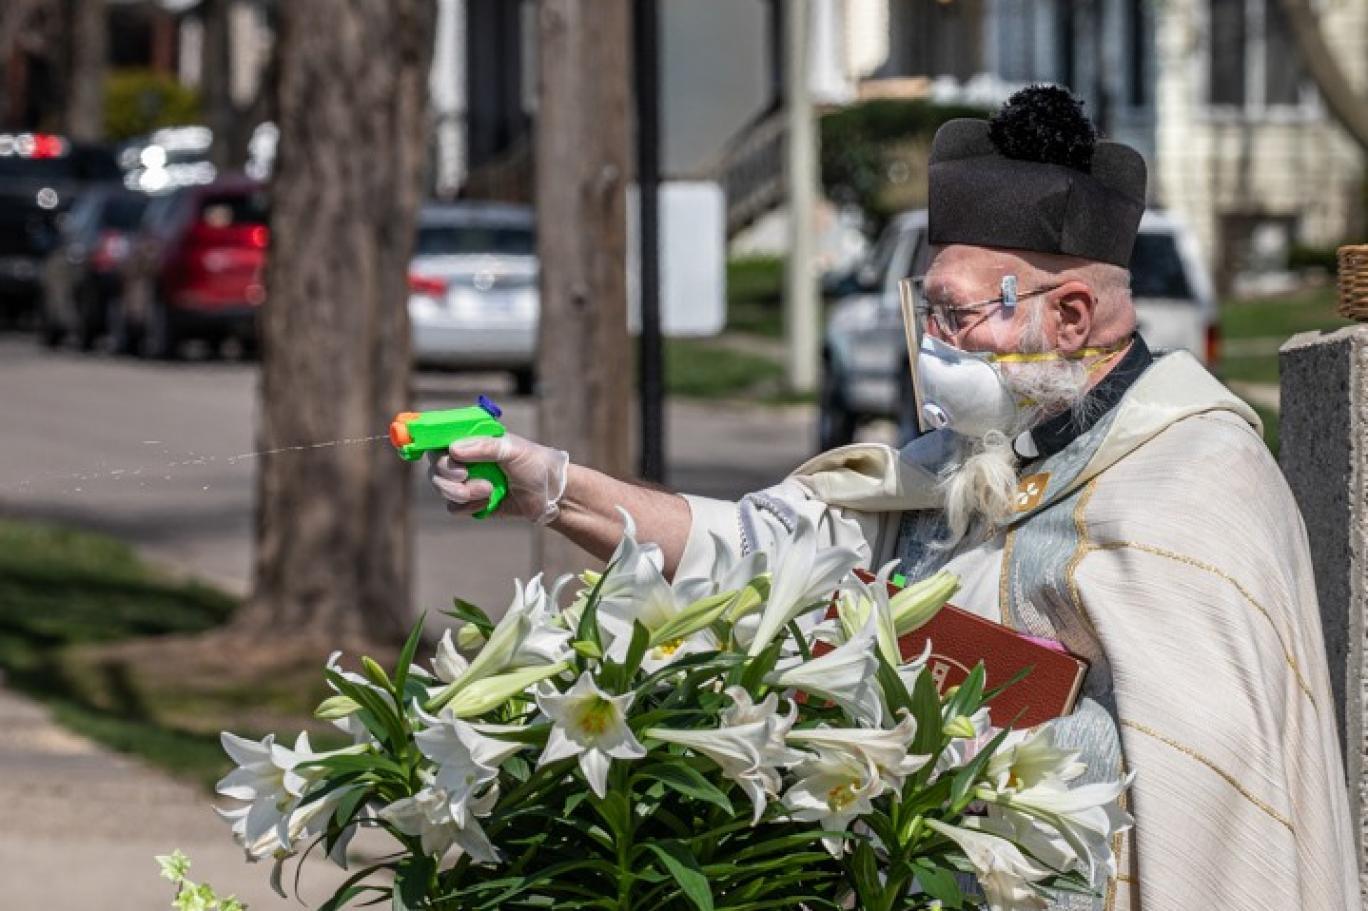 Cemaatine su tabancasıyla kutsal su fışkırtan rahip